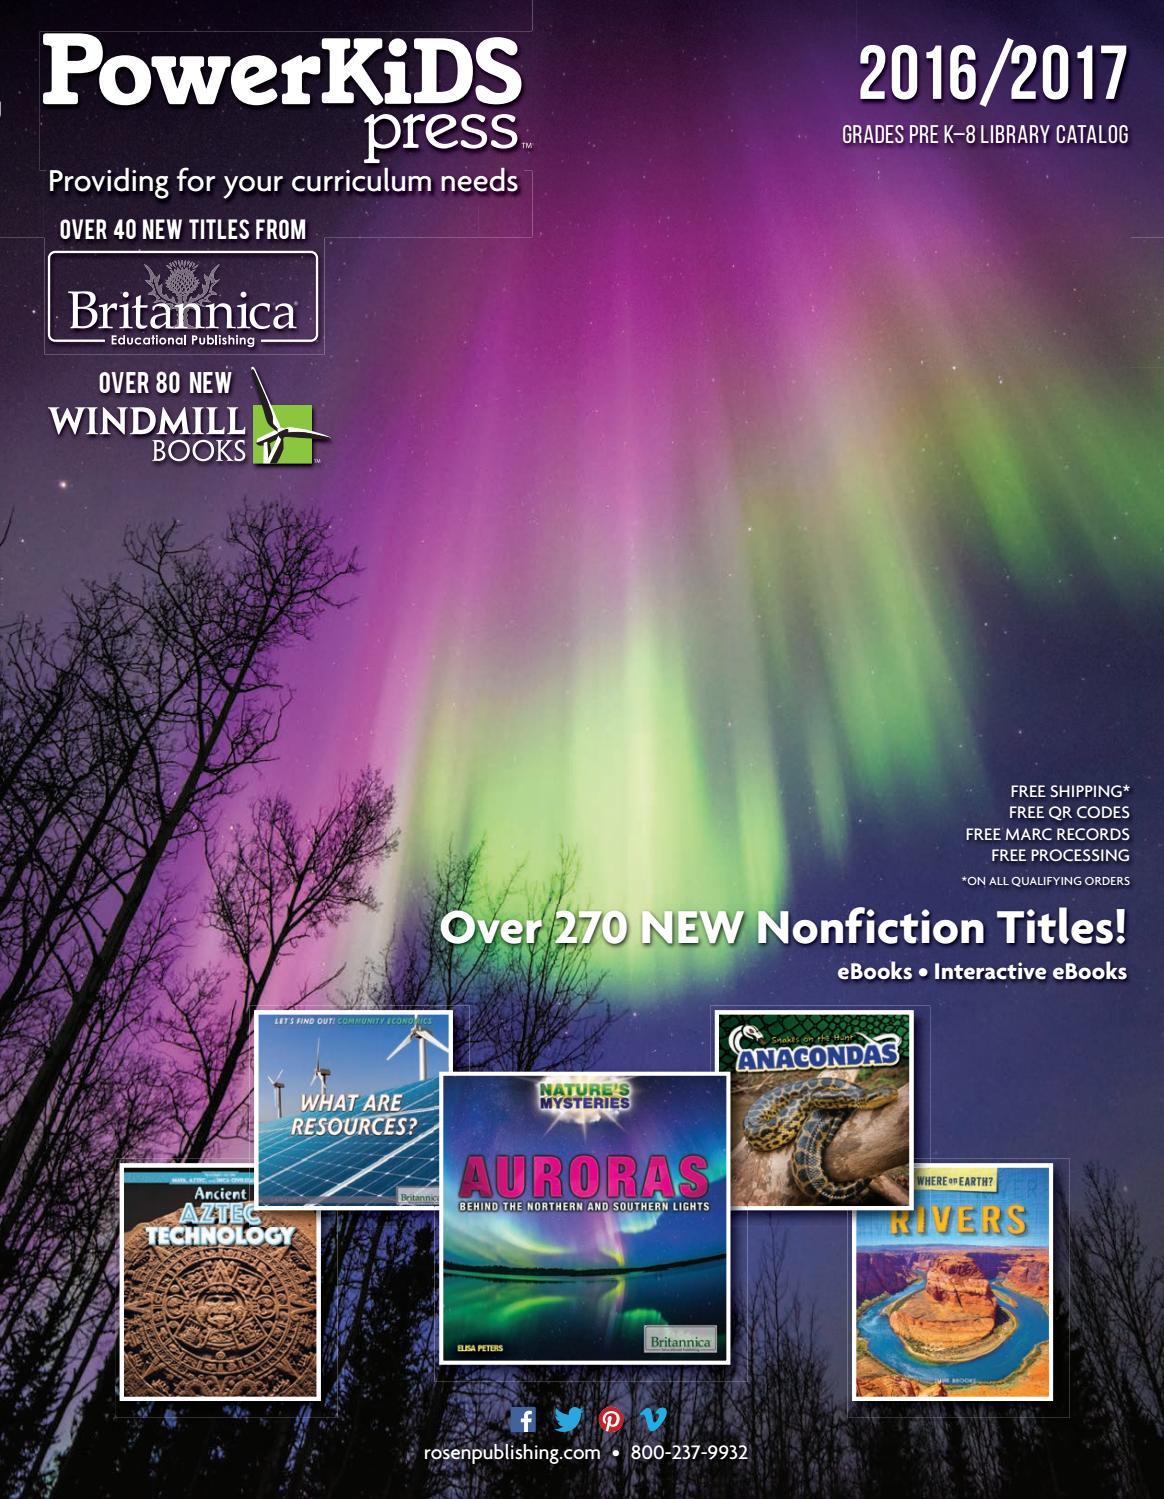 Powerkids press 2016 2017 catalog by rosen publishing issuu fandeluxe Images